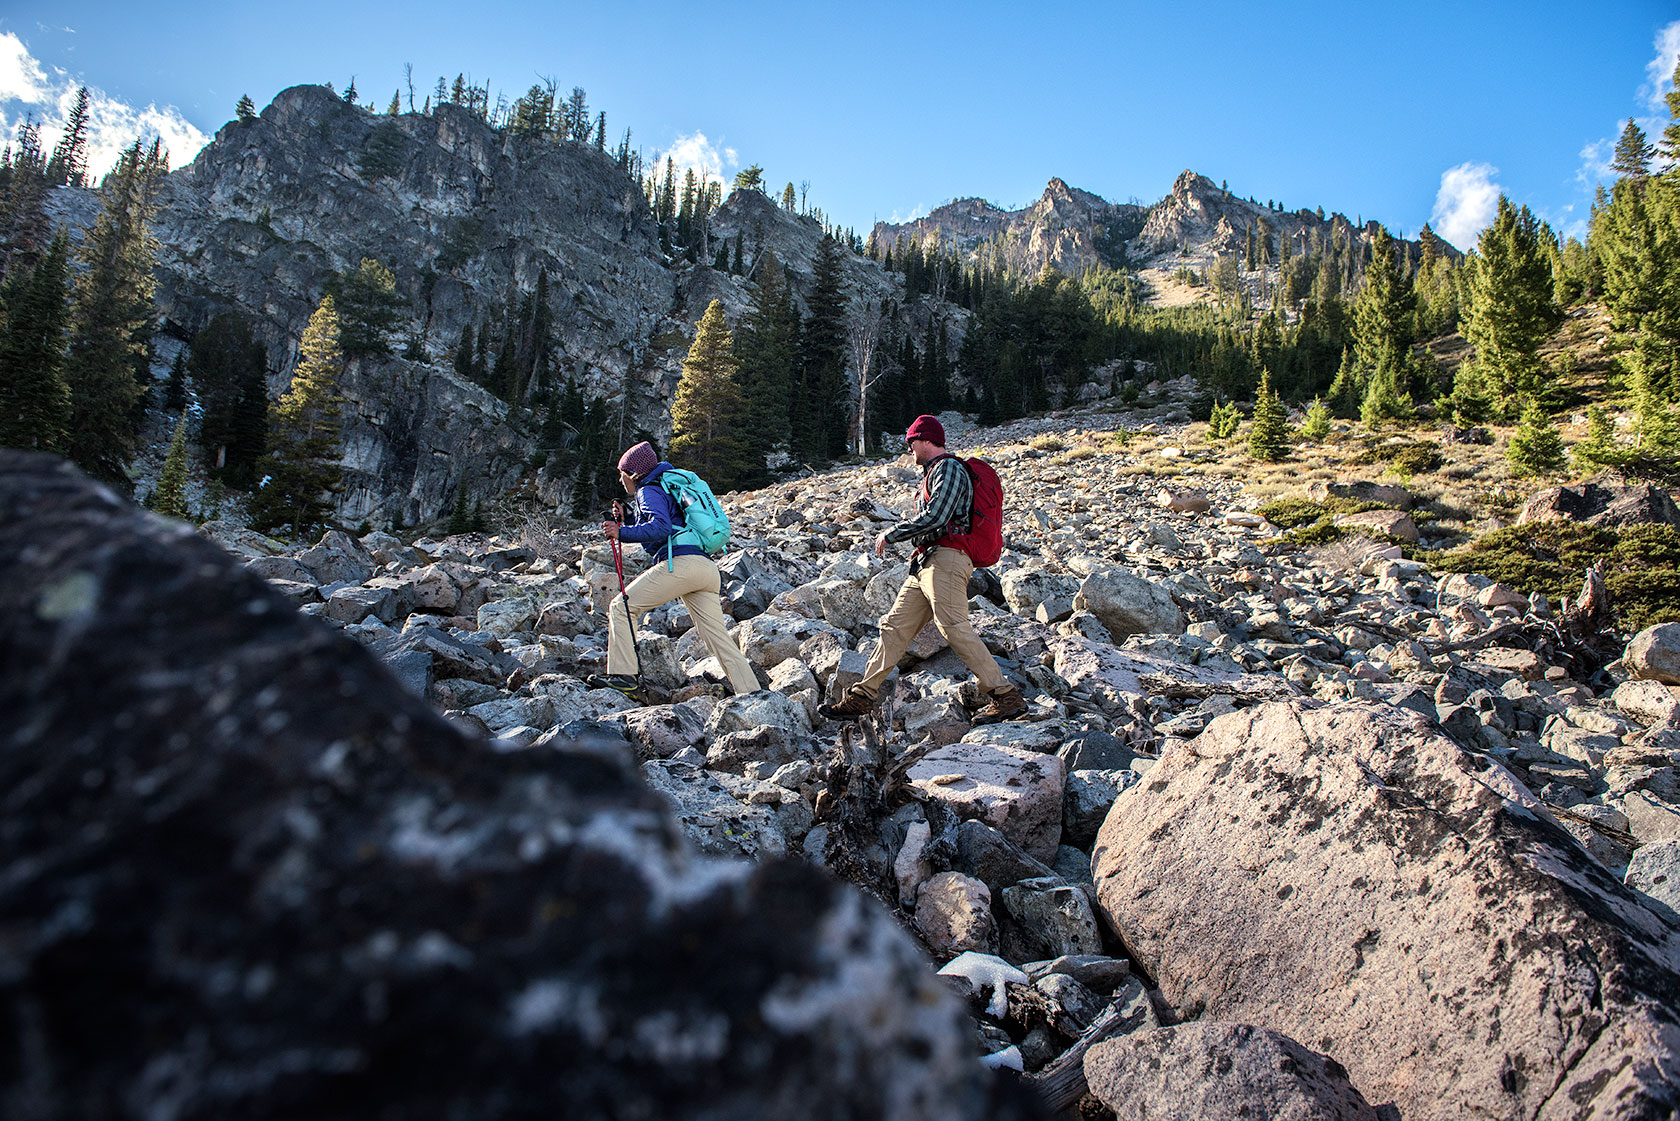 austin-trigg-patagonia-sawtooth-hiking-bench-lakes-bushwhack-advenure-wilderness-forest-idaho-outside-lifestyle-day-fall-weather-mountains-boulder-feild.jpg